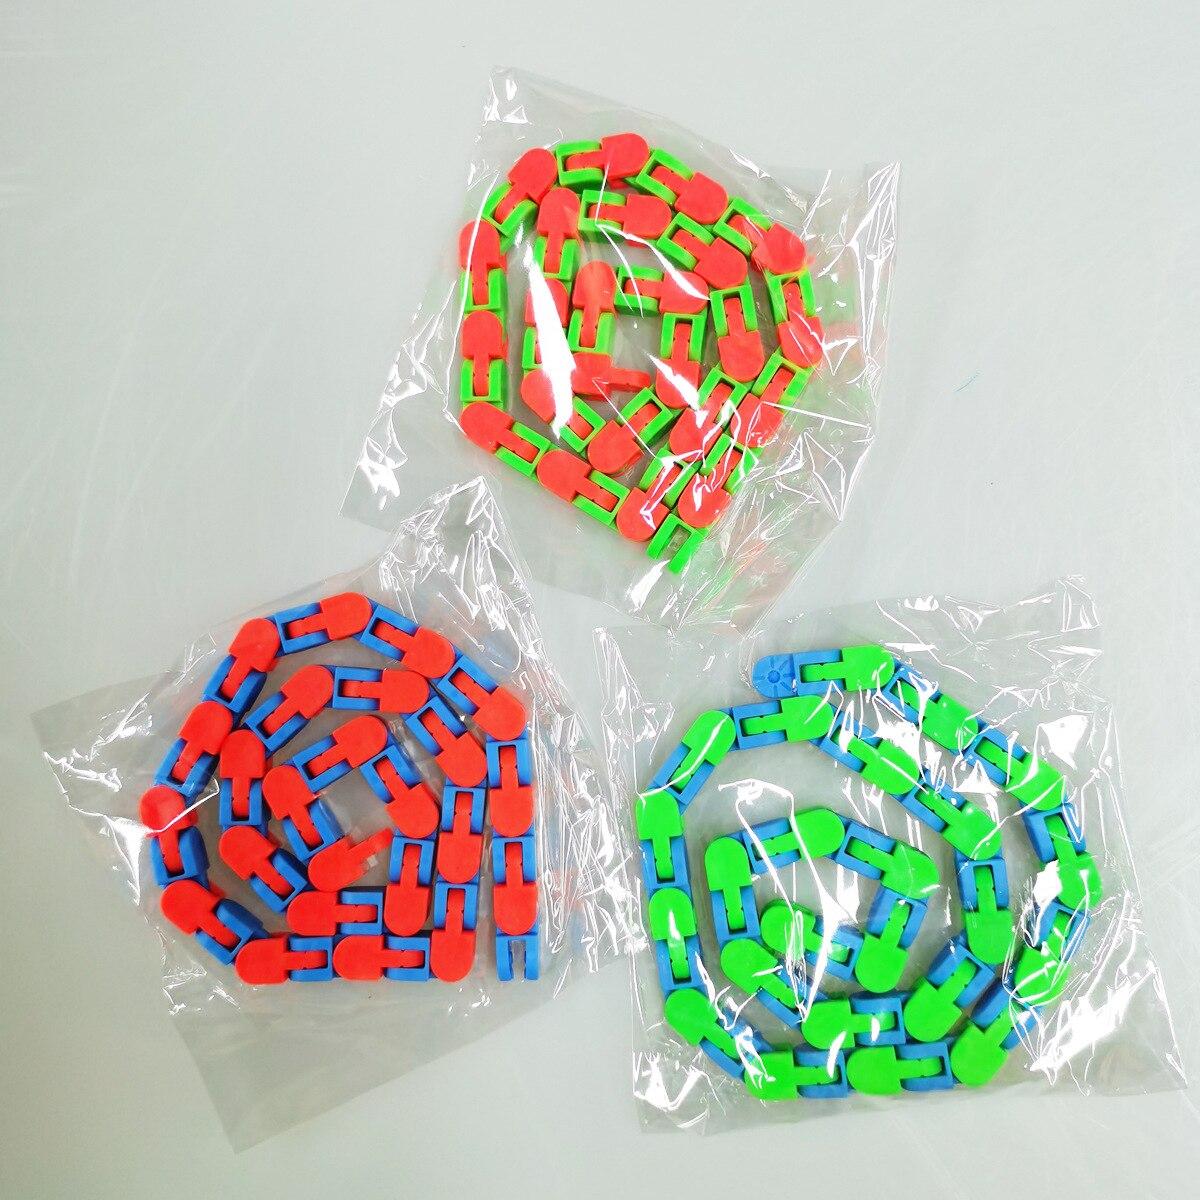 1PCS 48 Knots Fidget Toys Children And Adults Puzzle Decompression 48-Segment Chain DIY Bicycle Chain Toy Fluid Bracelet Sensory img2